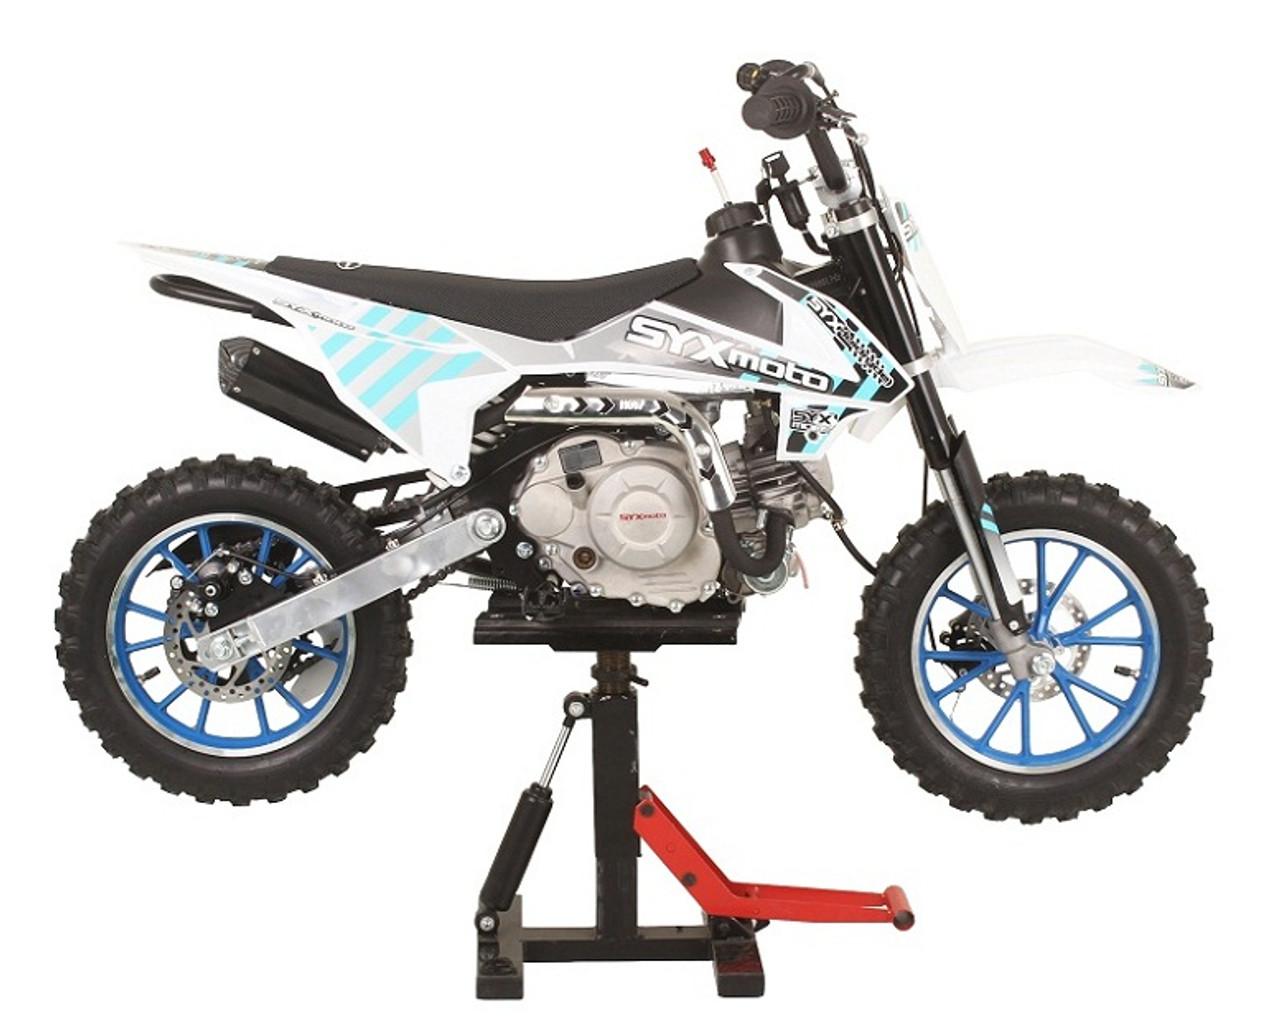 Ice Bear Tearoff (PAD60-1) 60cc Dirt Bike, Electric Starter, Fully Automatic